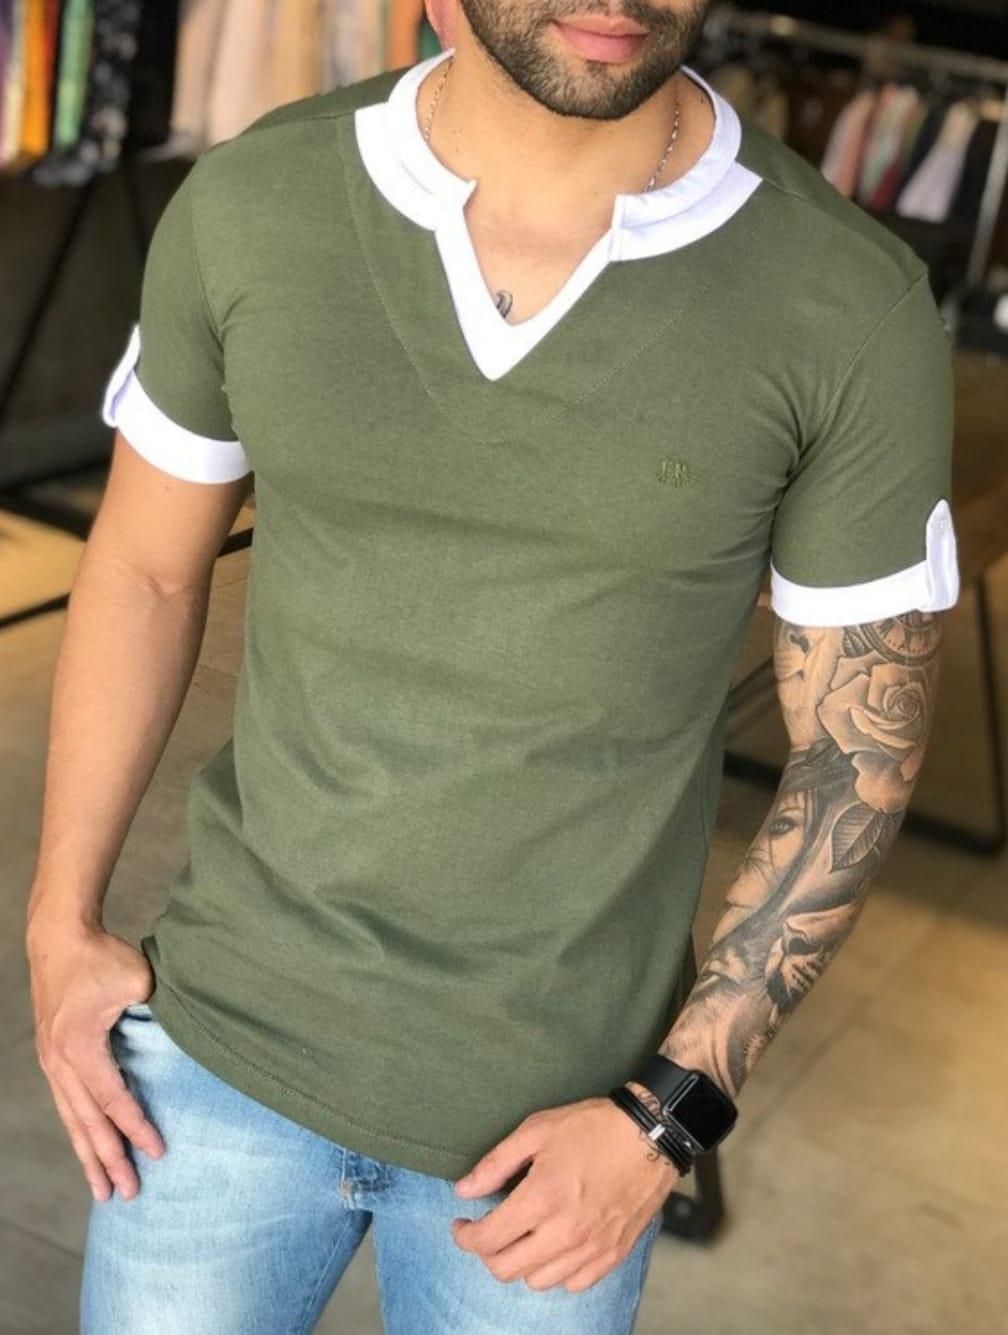 Camiseta M Artt Verde Detalhes Branco Gola V  - Harpia Moda - Moda Masculina & Acessórios